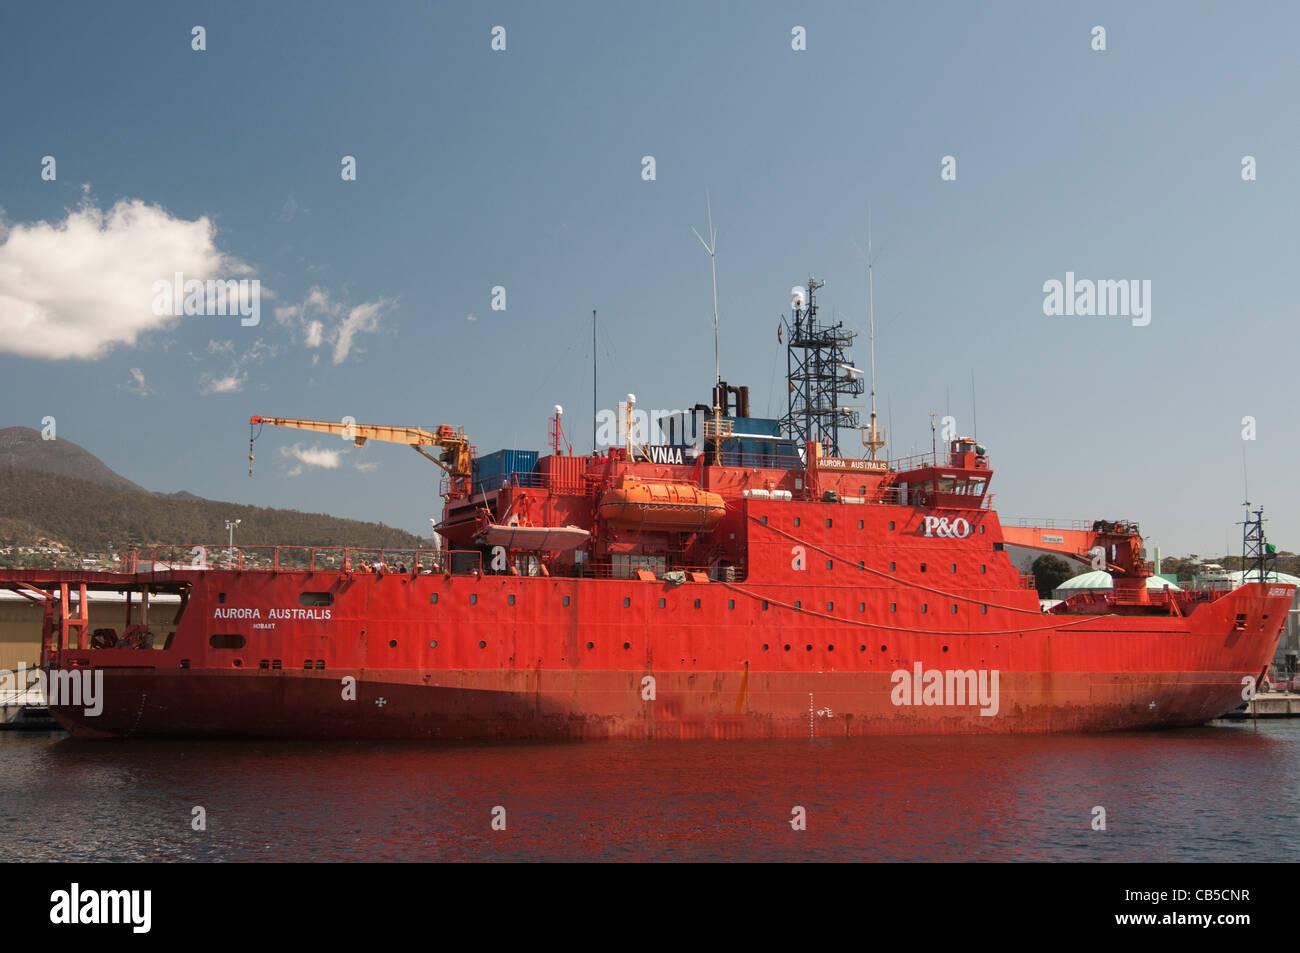 Australian Antarctic (ANARE) supply vessel 'Aurora Australis' at anchor in Hobart, Tasmania. - Stock Image